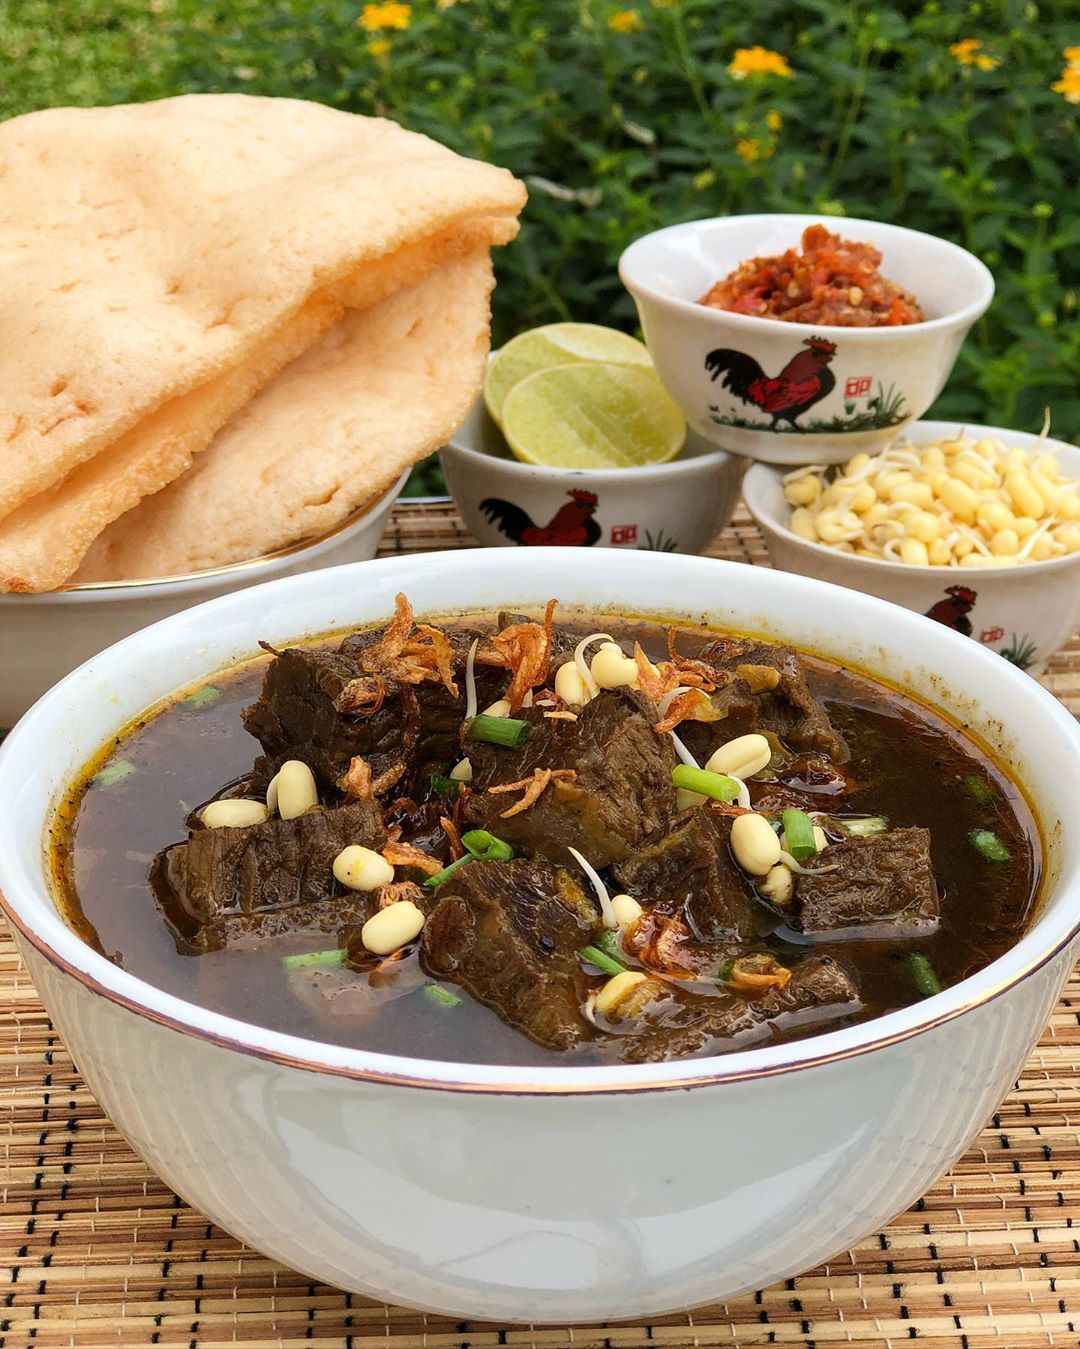 Resep Rawon Daging Sapi Khas Jawa Timur Spesial Enak Empuk Resep Resep Resep Masakan Daging